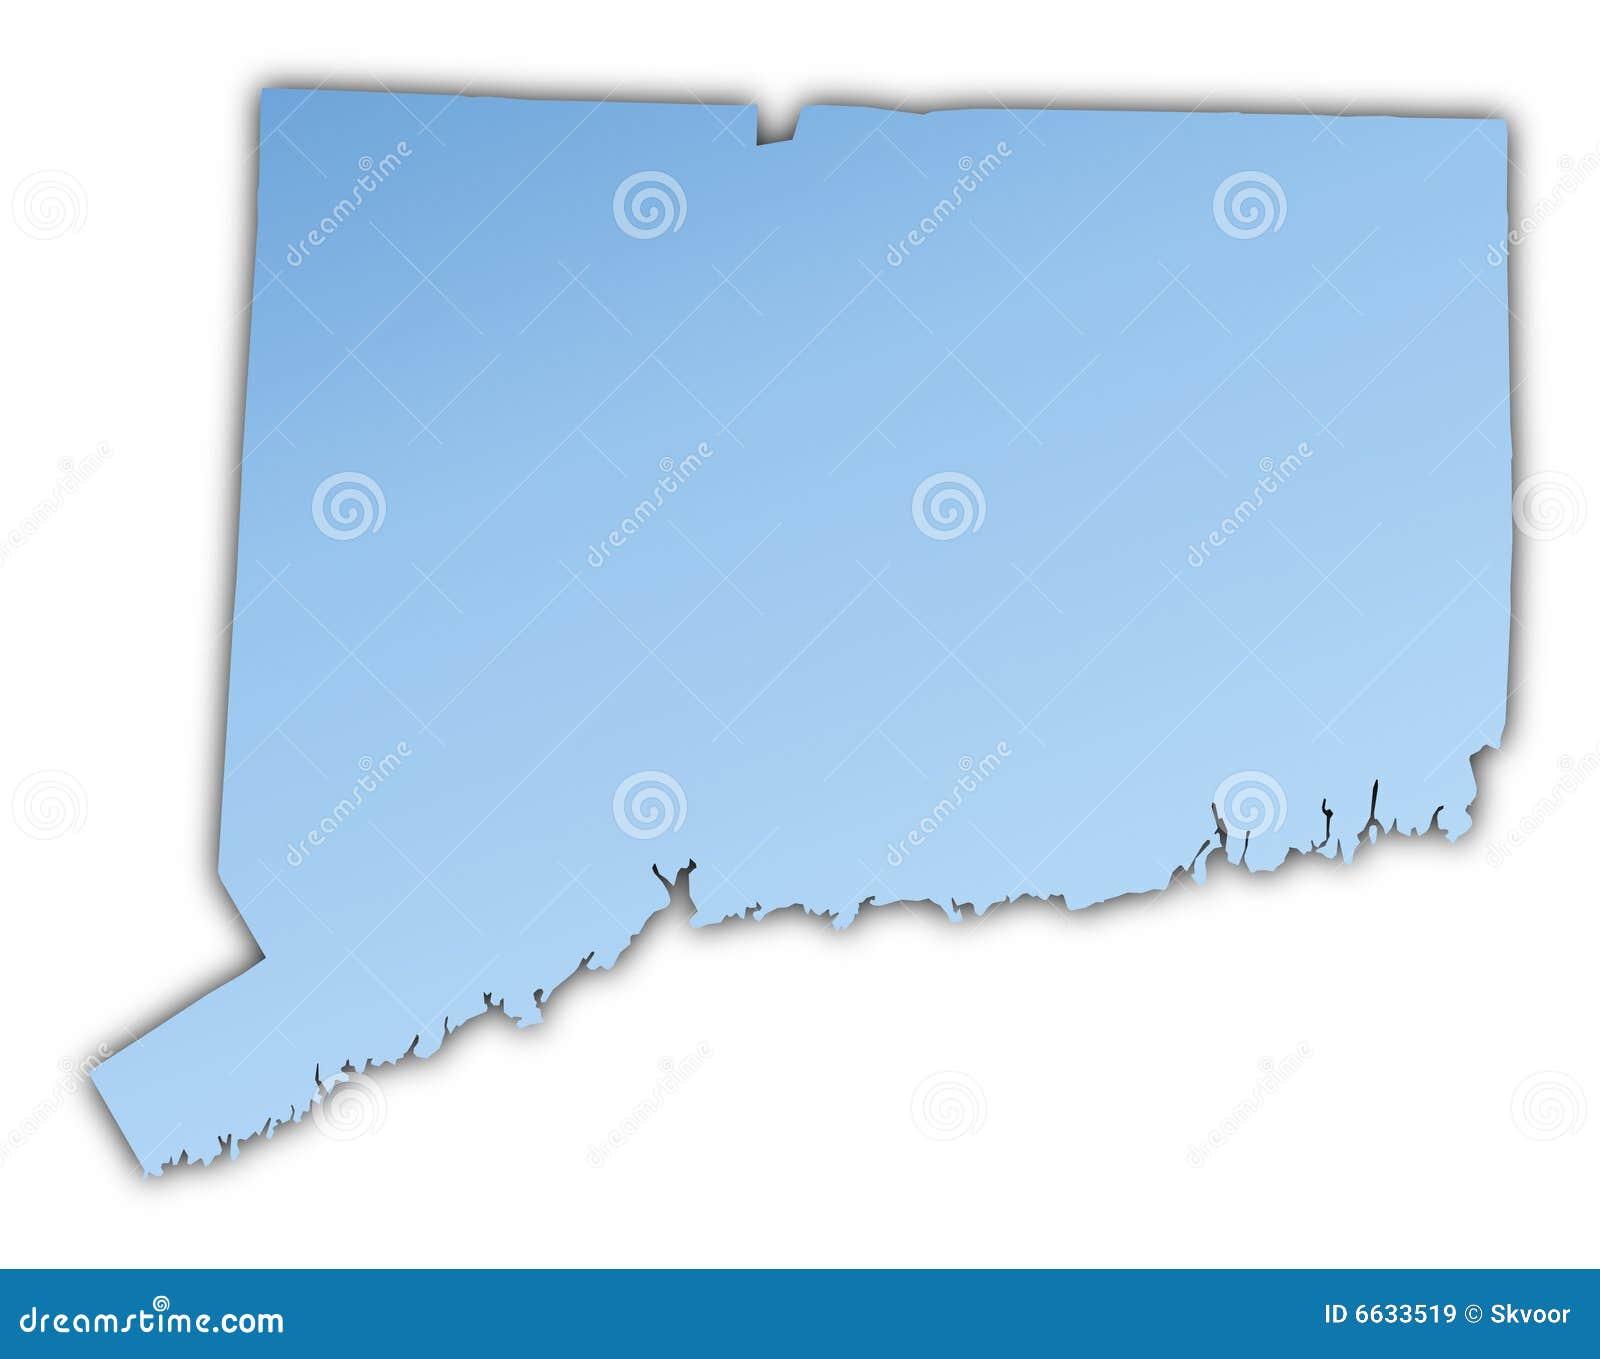 Connecticut(USA) map stock illustration. Illustration of connecticut ...